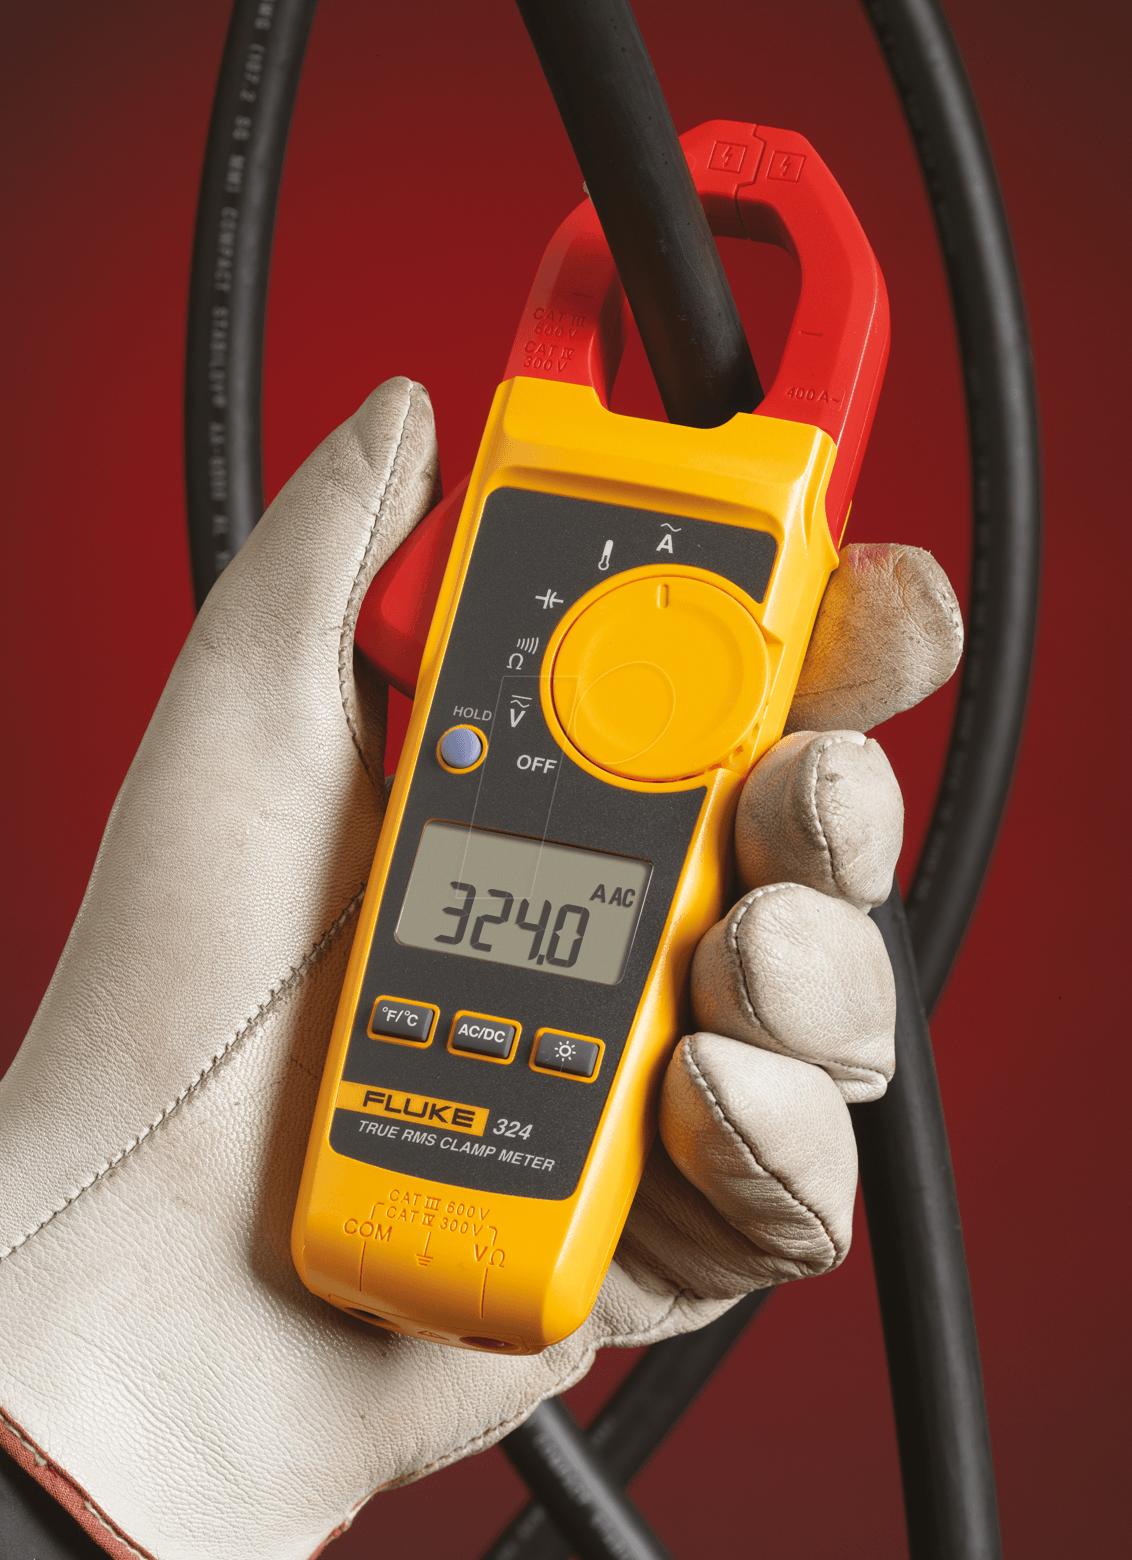 Fluke 333 Clamp Meter : Fluke true rms current clamp meter at